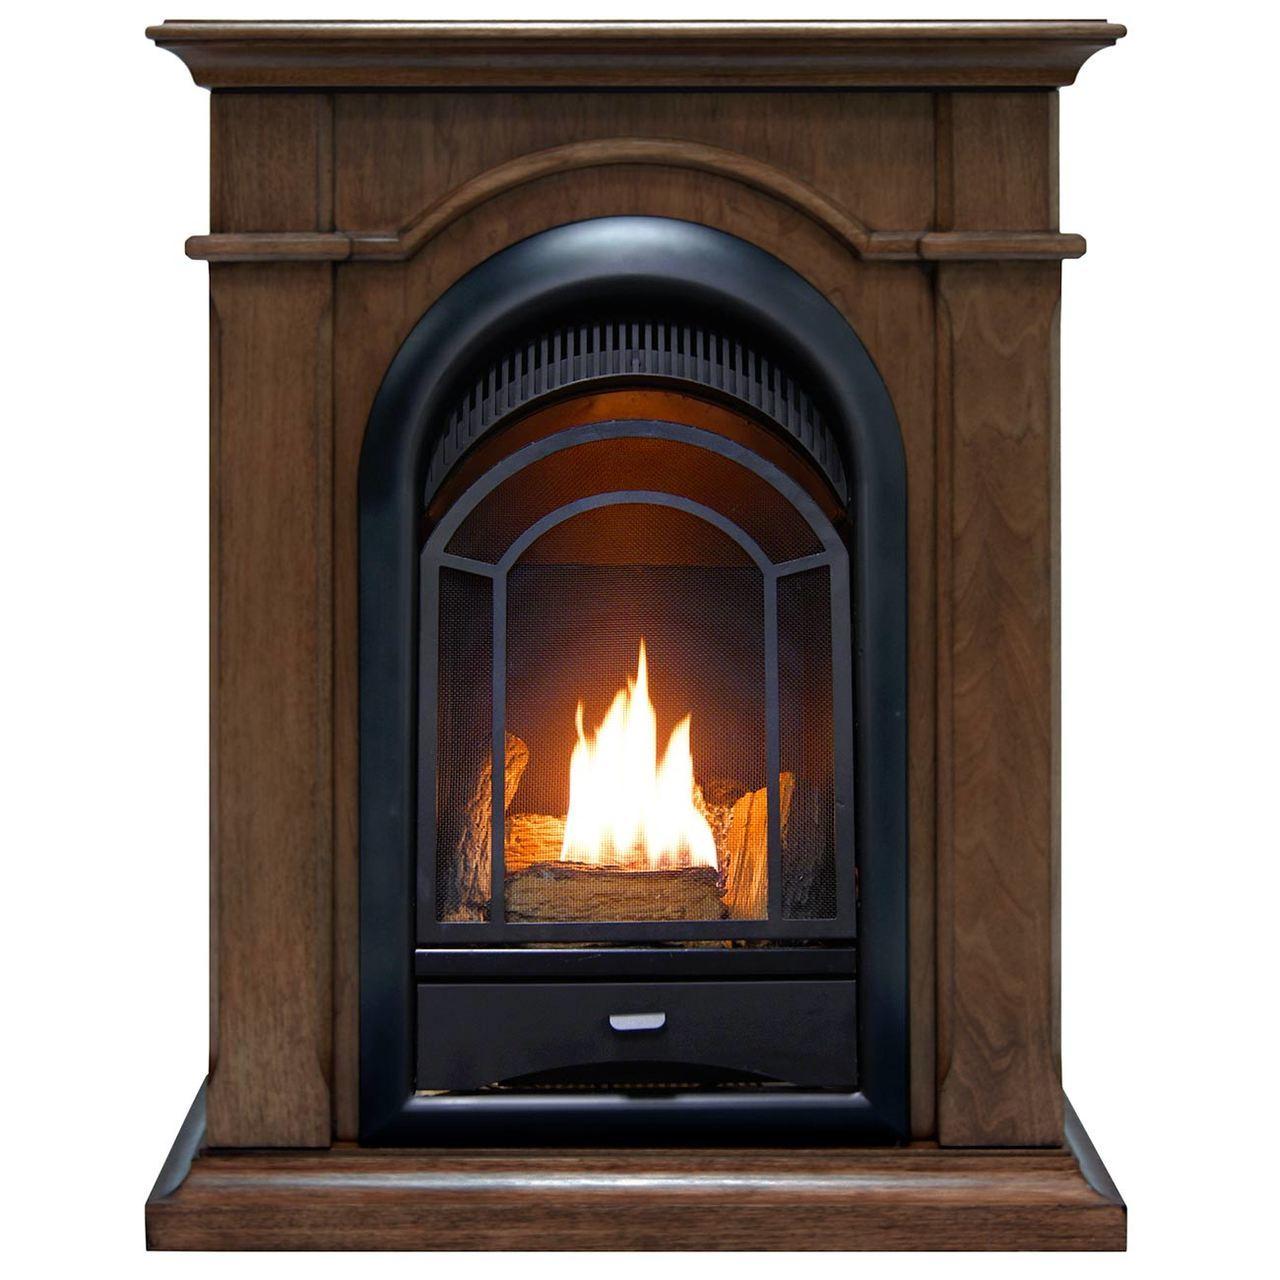 Factory Buys Direct Procom Fs100t W Ventless Fireplace System 10k